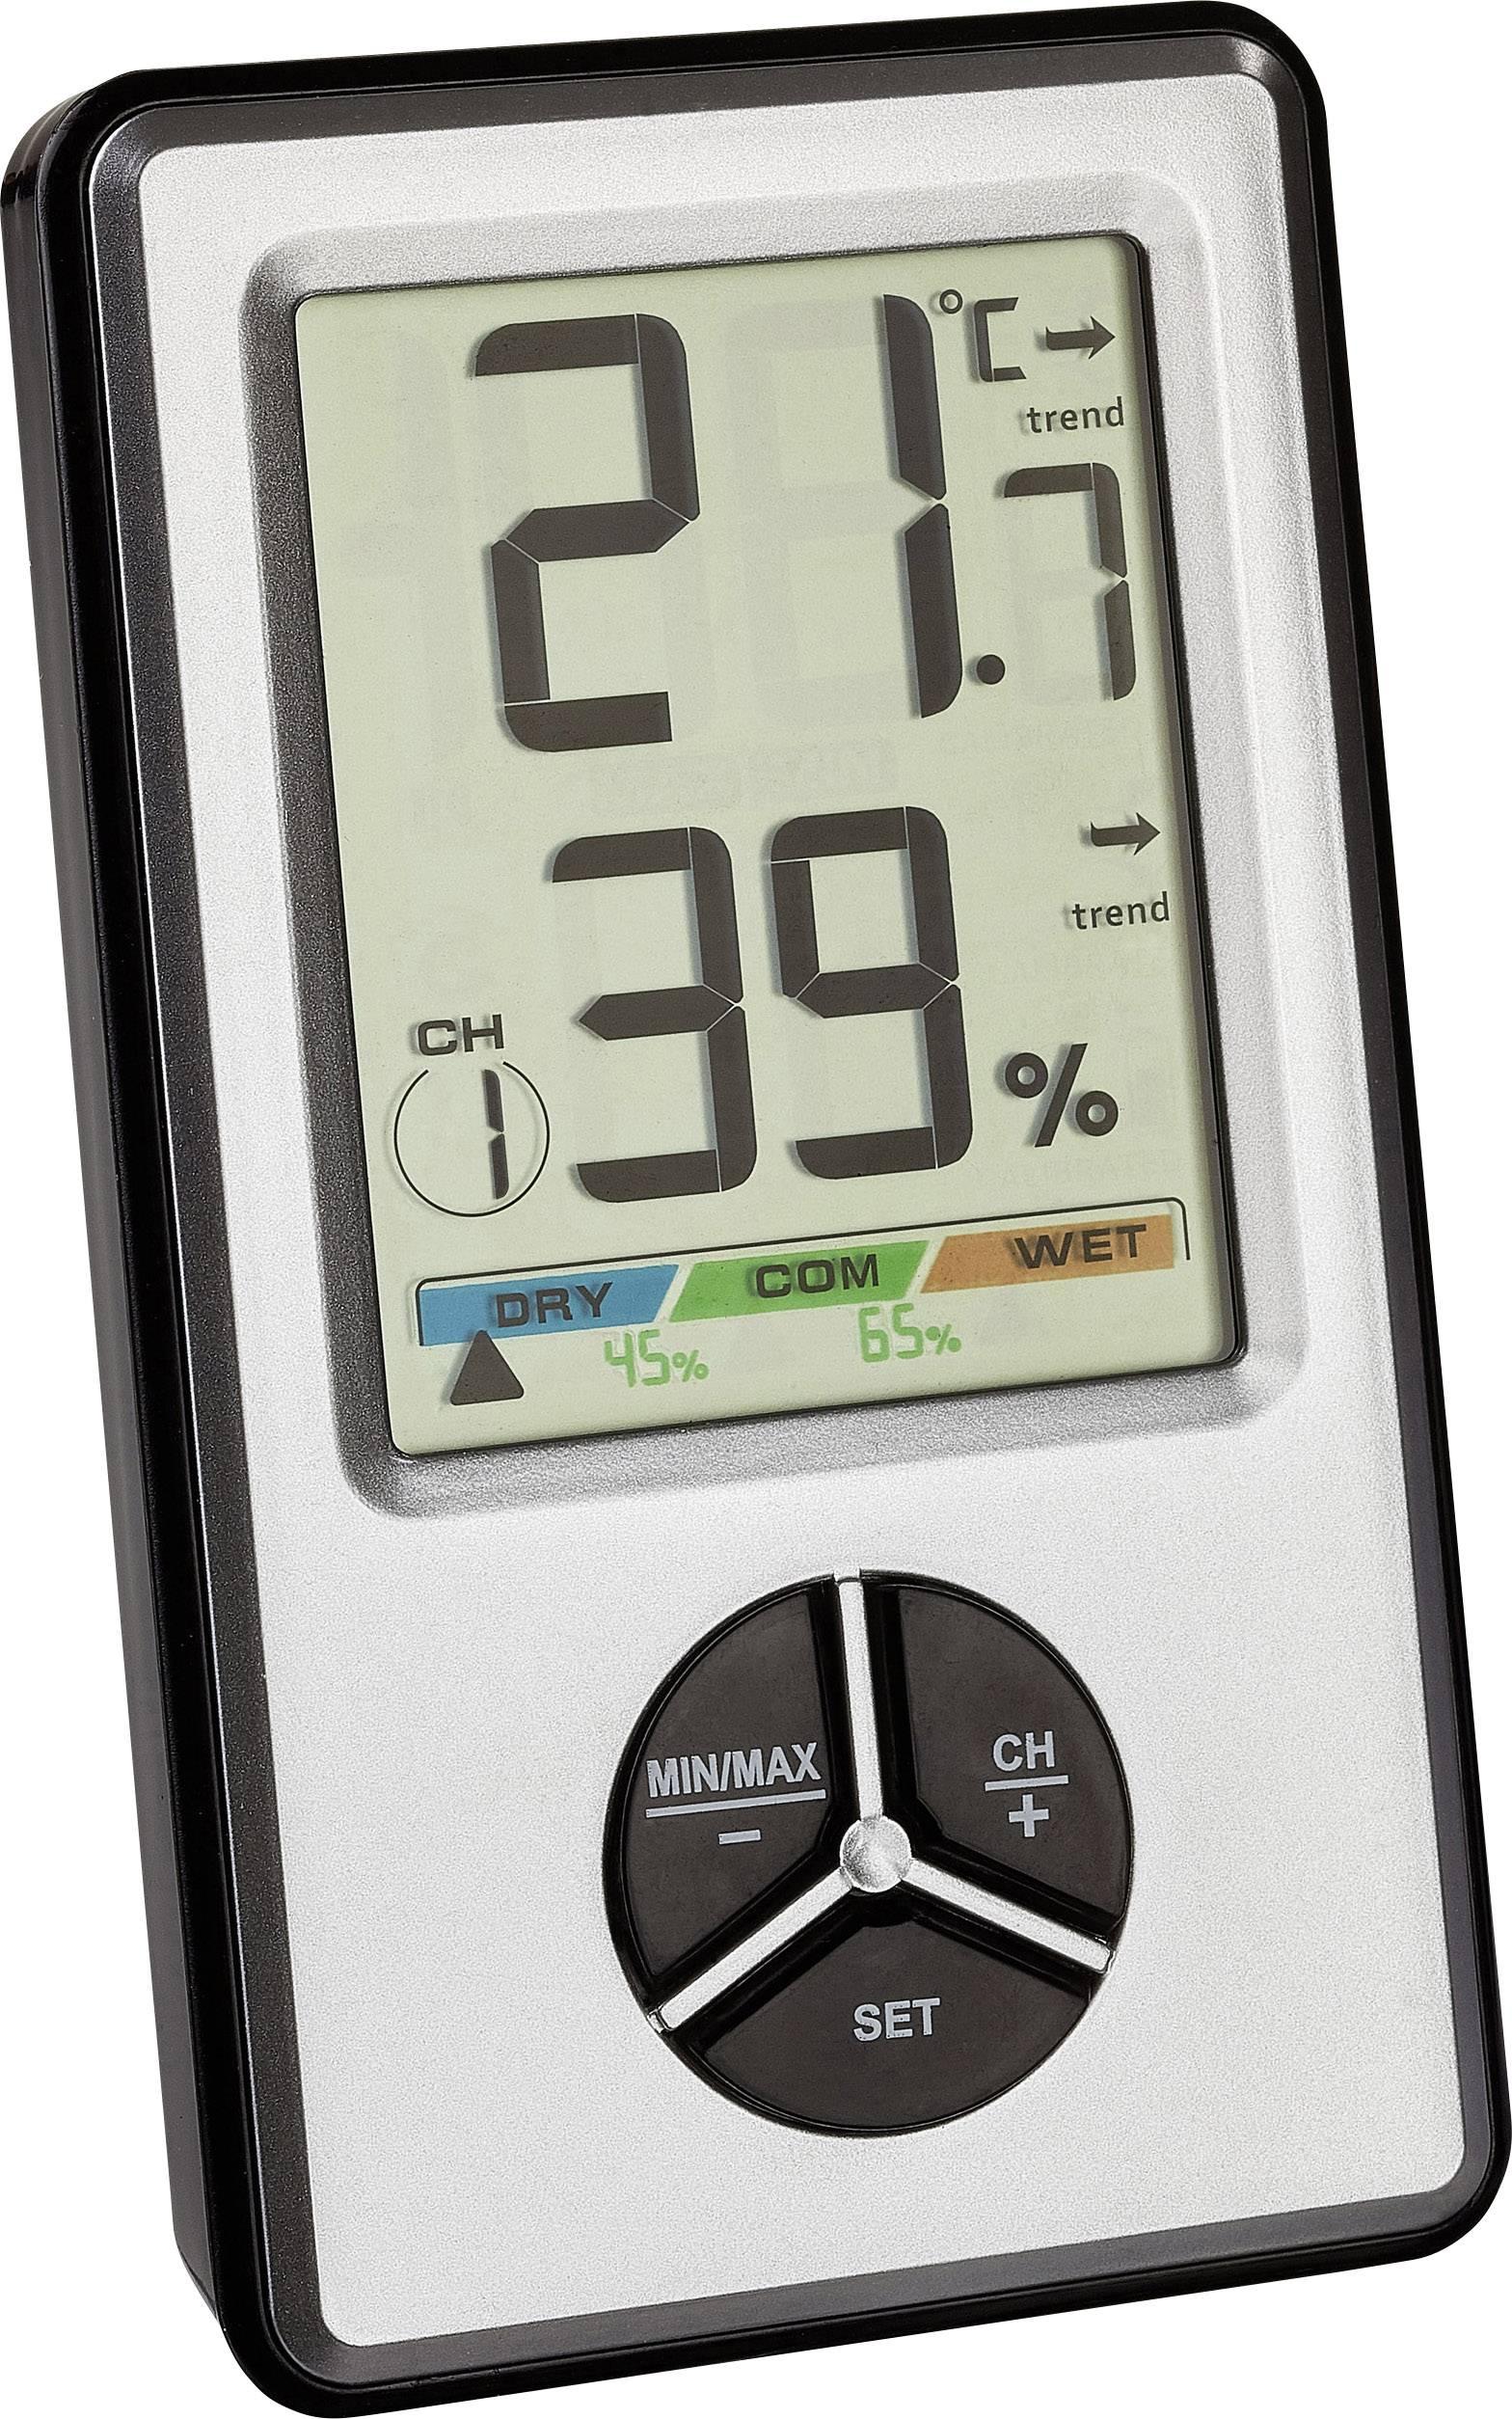 TFA Dostmann 30.5045.54 digitales Thermo Hygrometer Trådlös termo hygrometer Vit